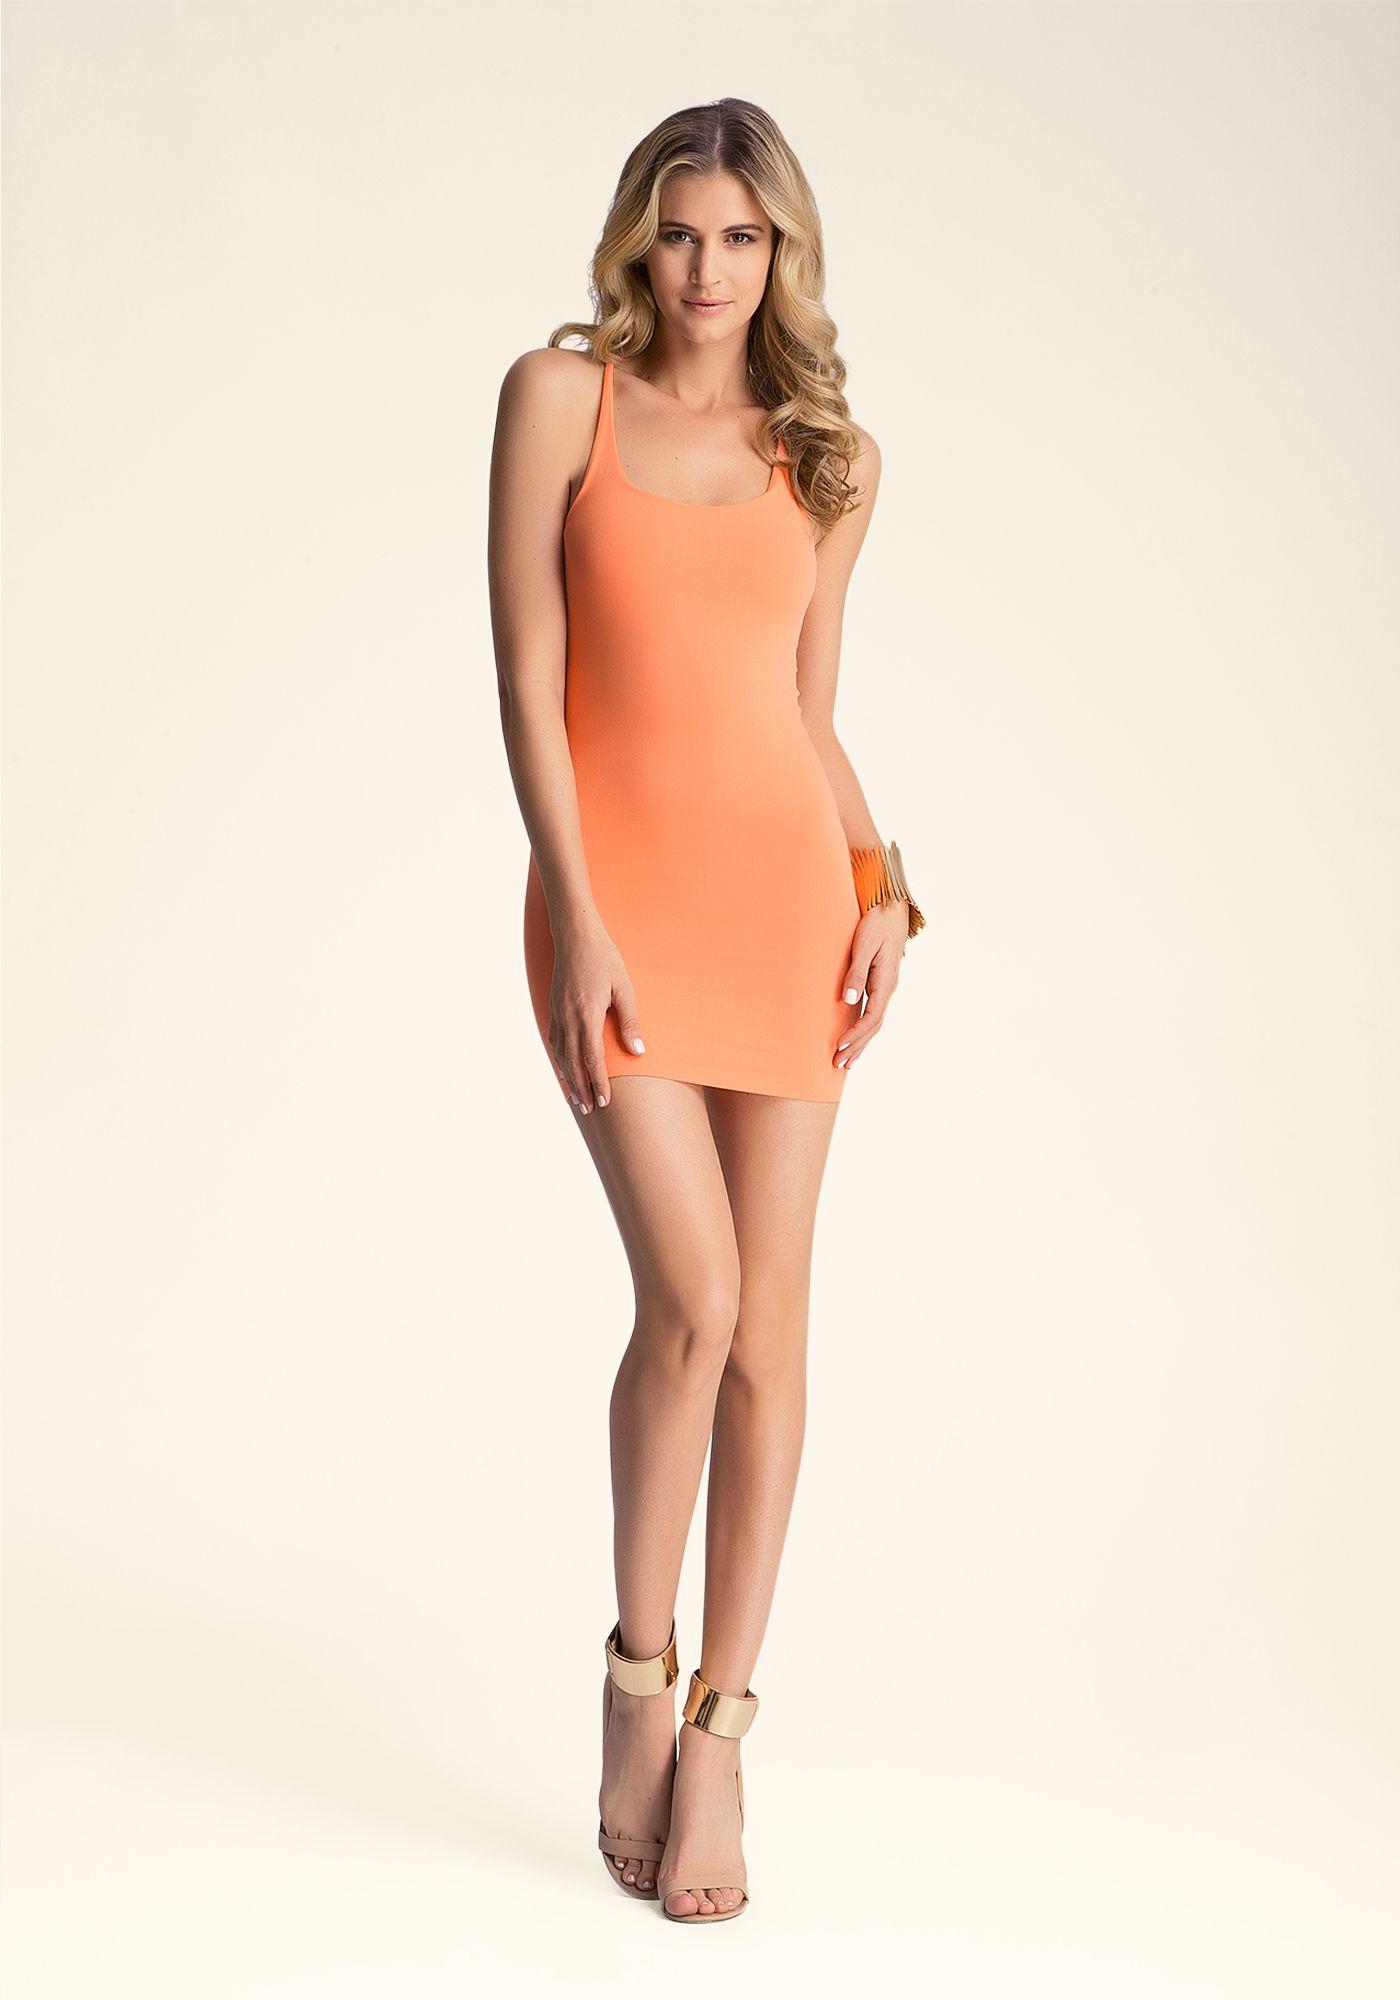 Bebe Twist Racerback Dress Tayler Rose 227387 Psm Racerback Dress Bodycon Dress Fashion [ 2000 x 1400 Pixel ]